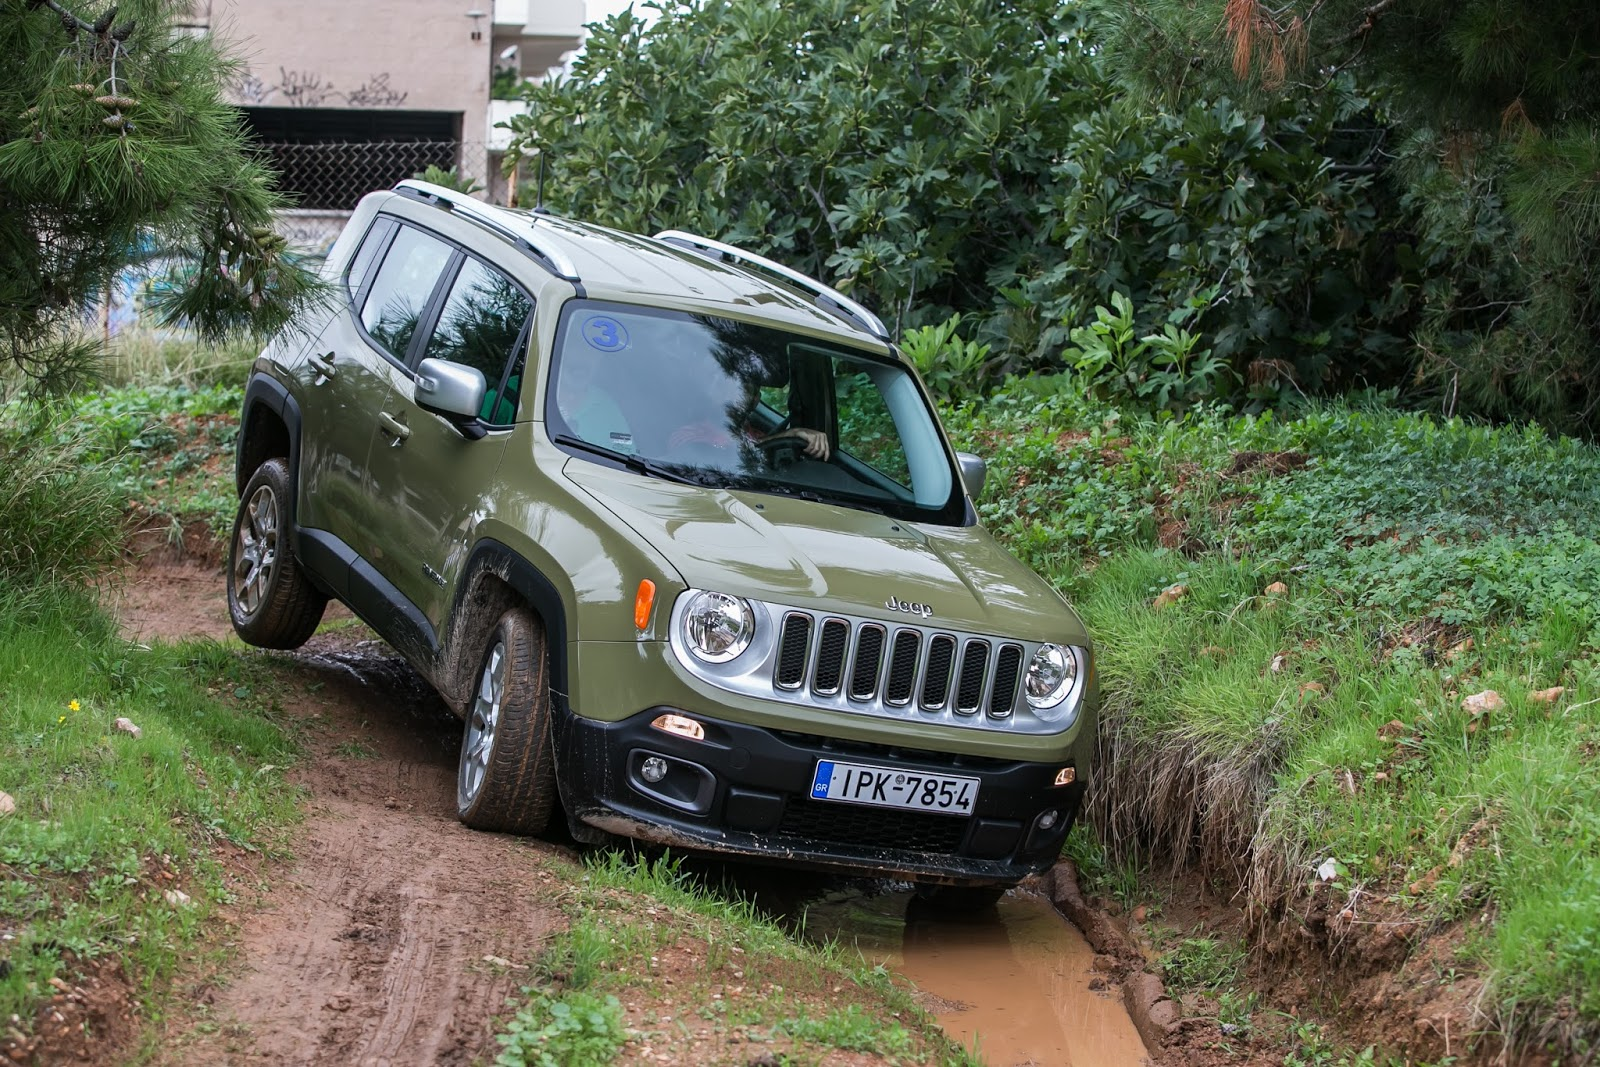 KF 1515 Πετάμε ένα Jeep Renegade σε λάσπες, πέτρες, άμμο, λίμνες. Θα τα καταφέρει;